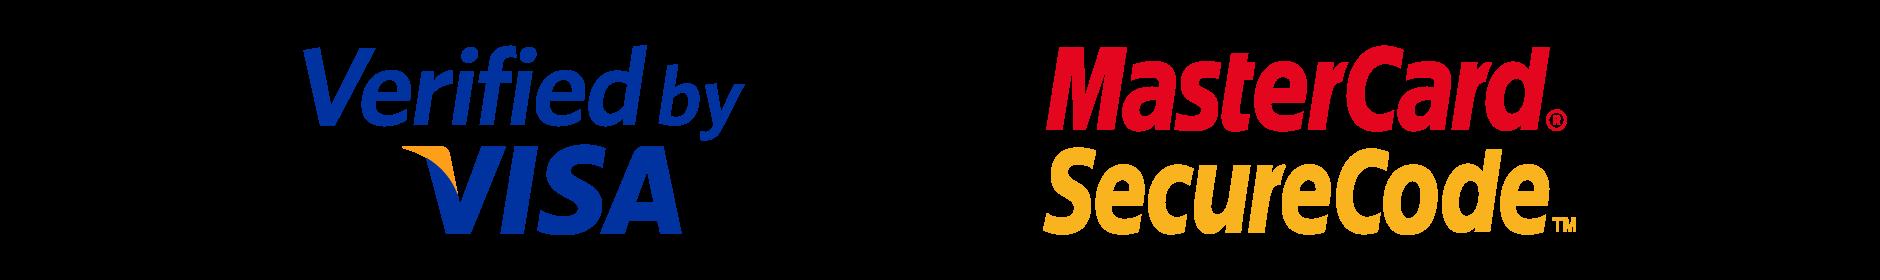 8 (499) 938 66 46